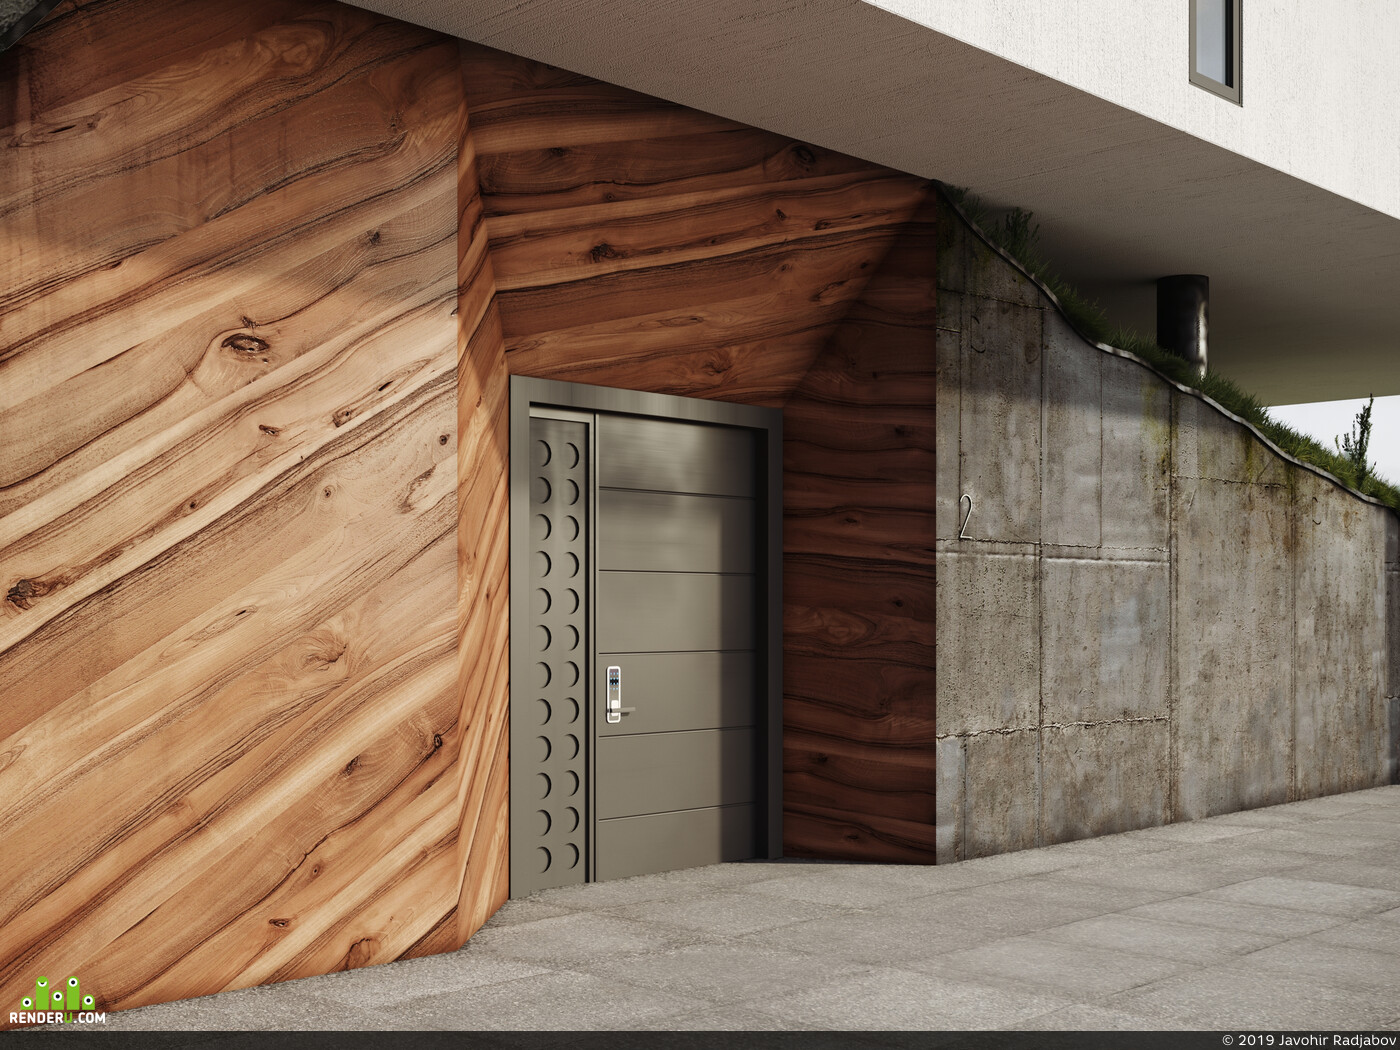 Architecture, corona render